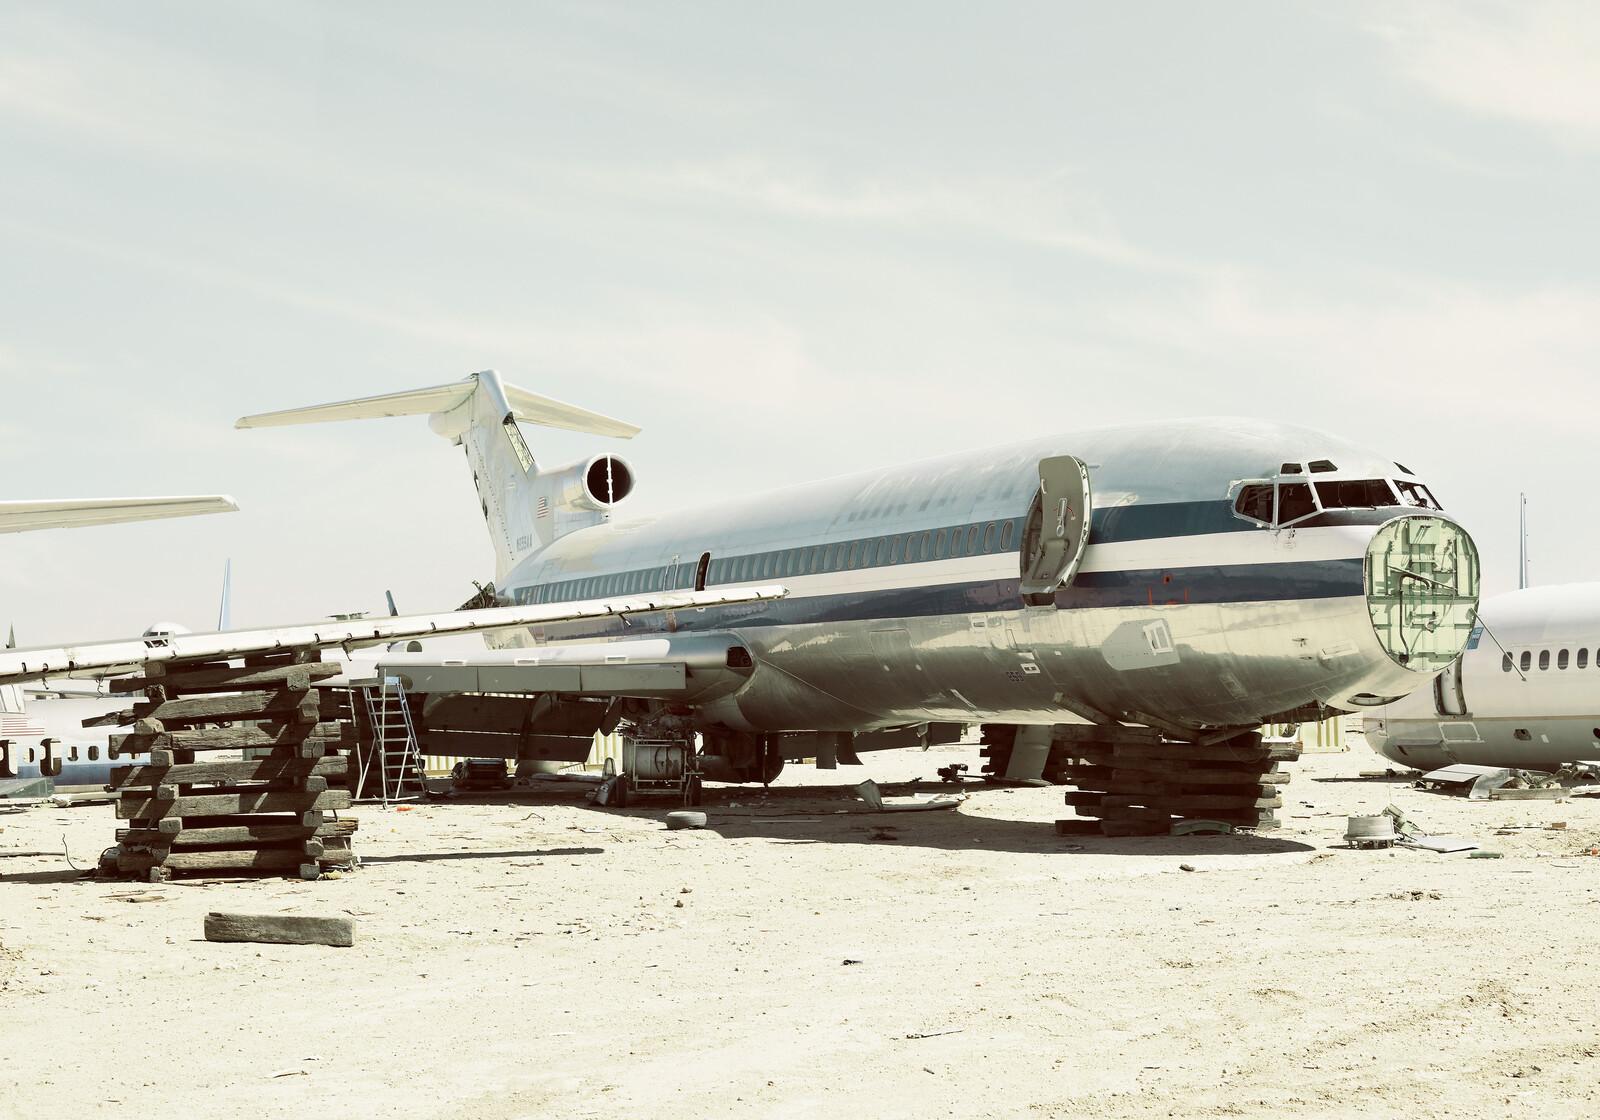 Off the Radar VIII - Marc Trautmann